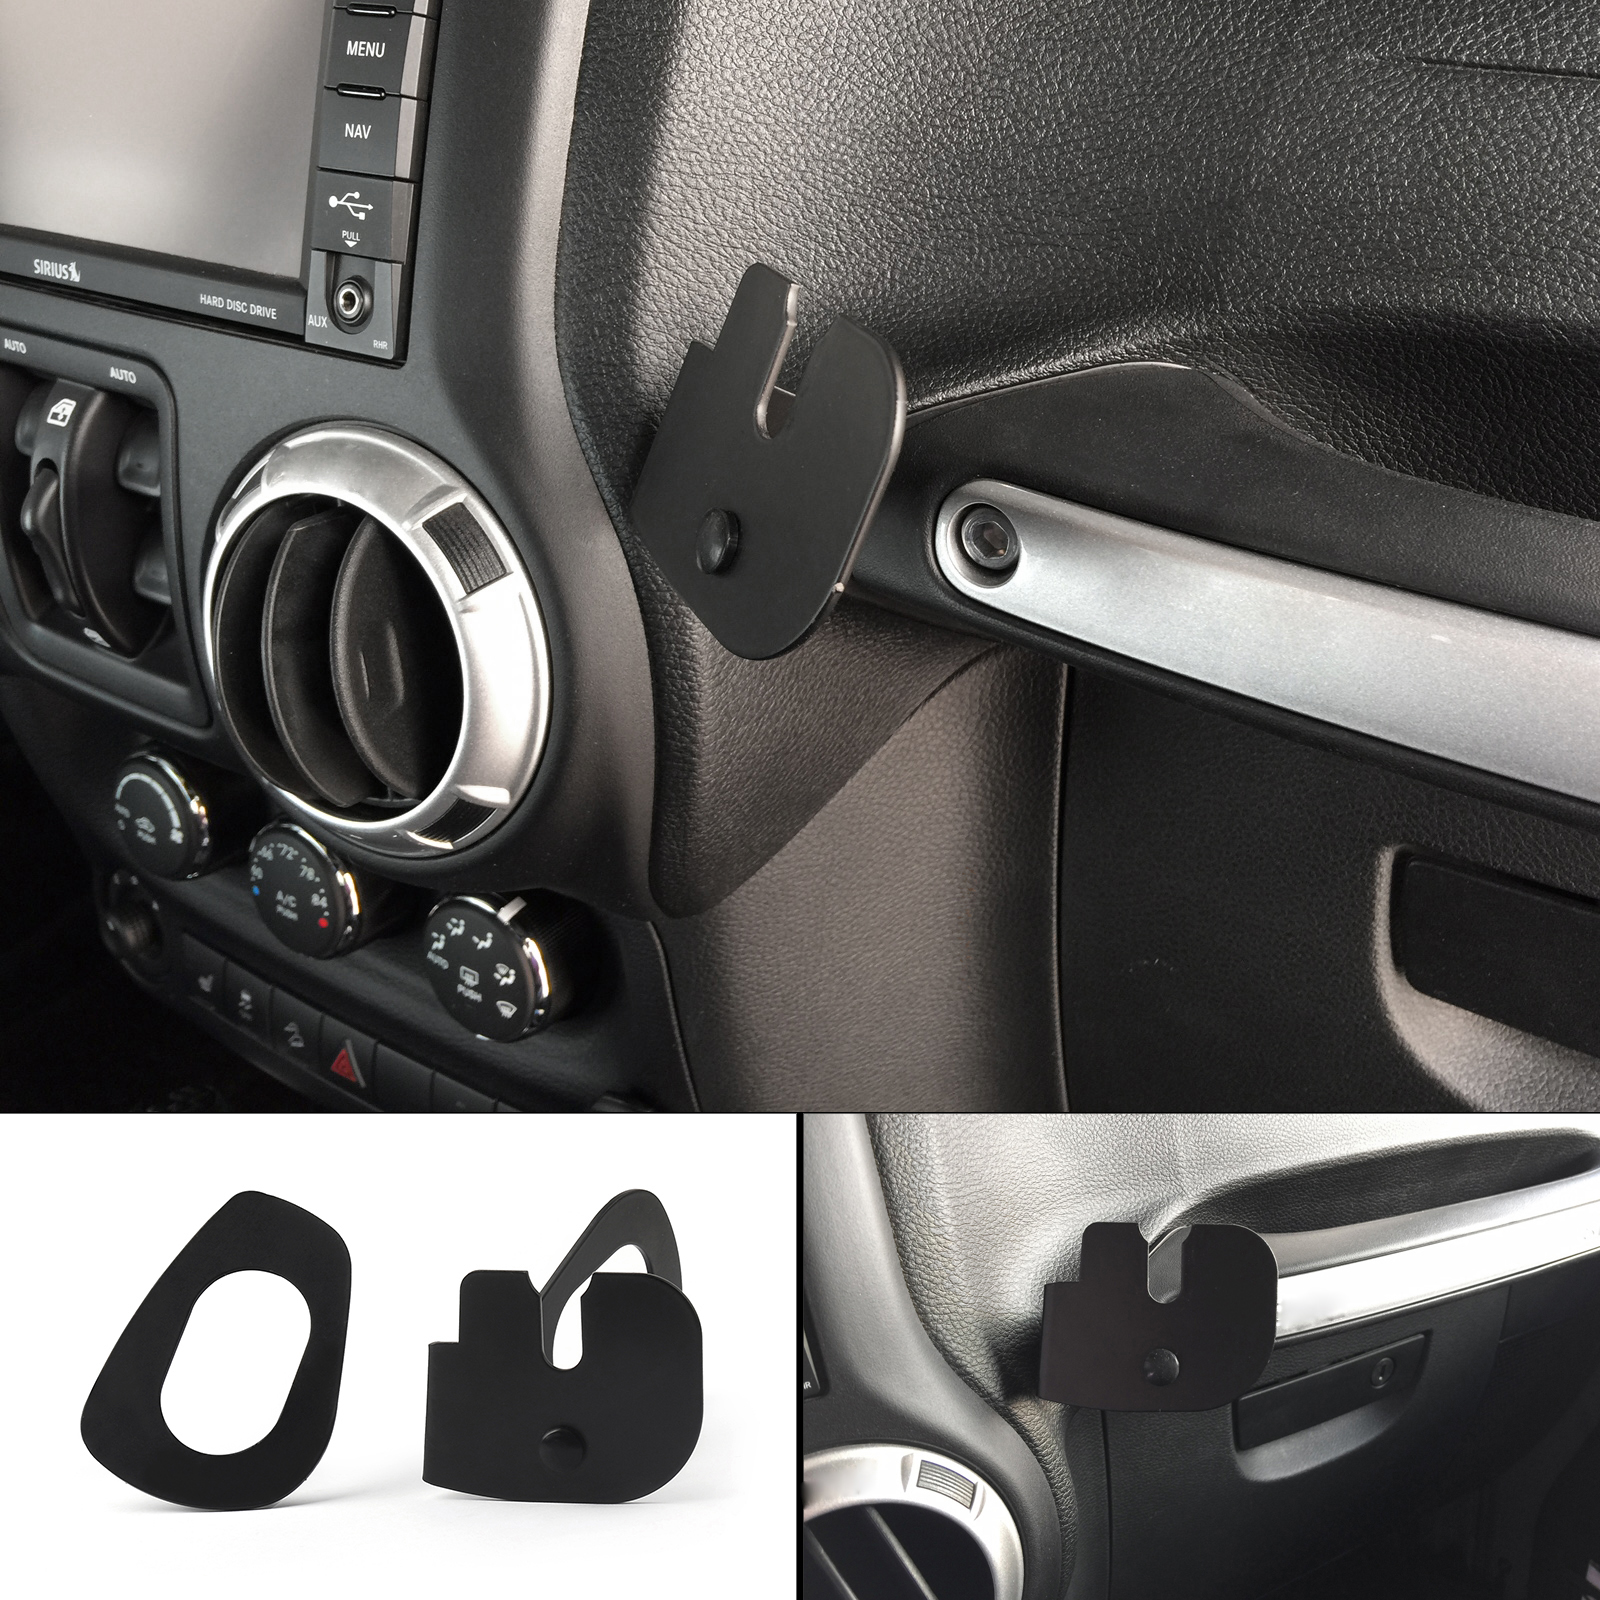 Artudatech For Wrangler JK 2011+ 75WXST CB Radio Mic Mount Holder Passenger Grab Bar Walkie Talkie Accessories